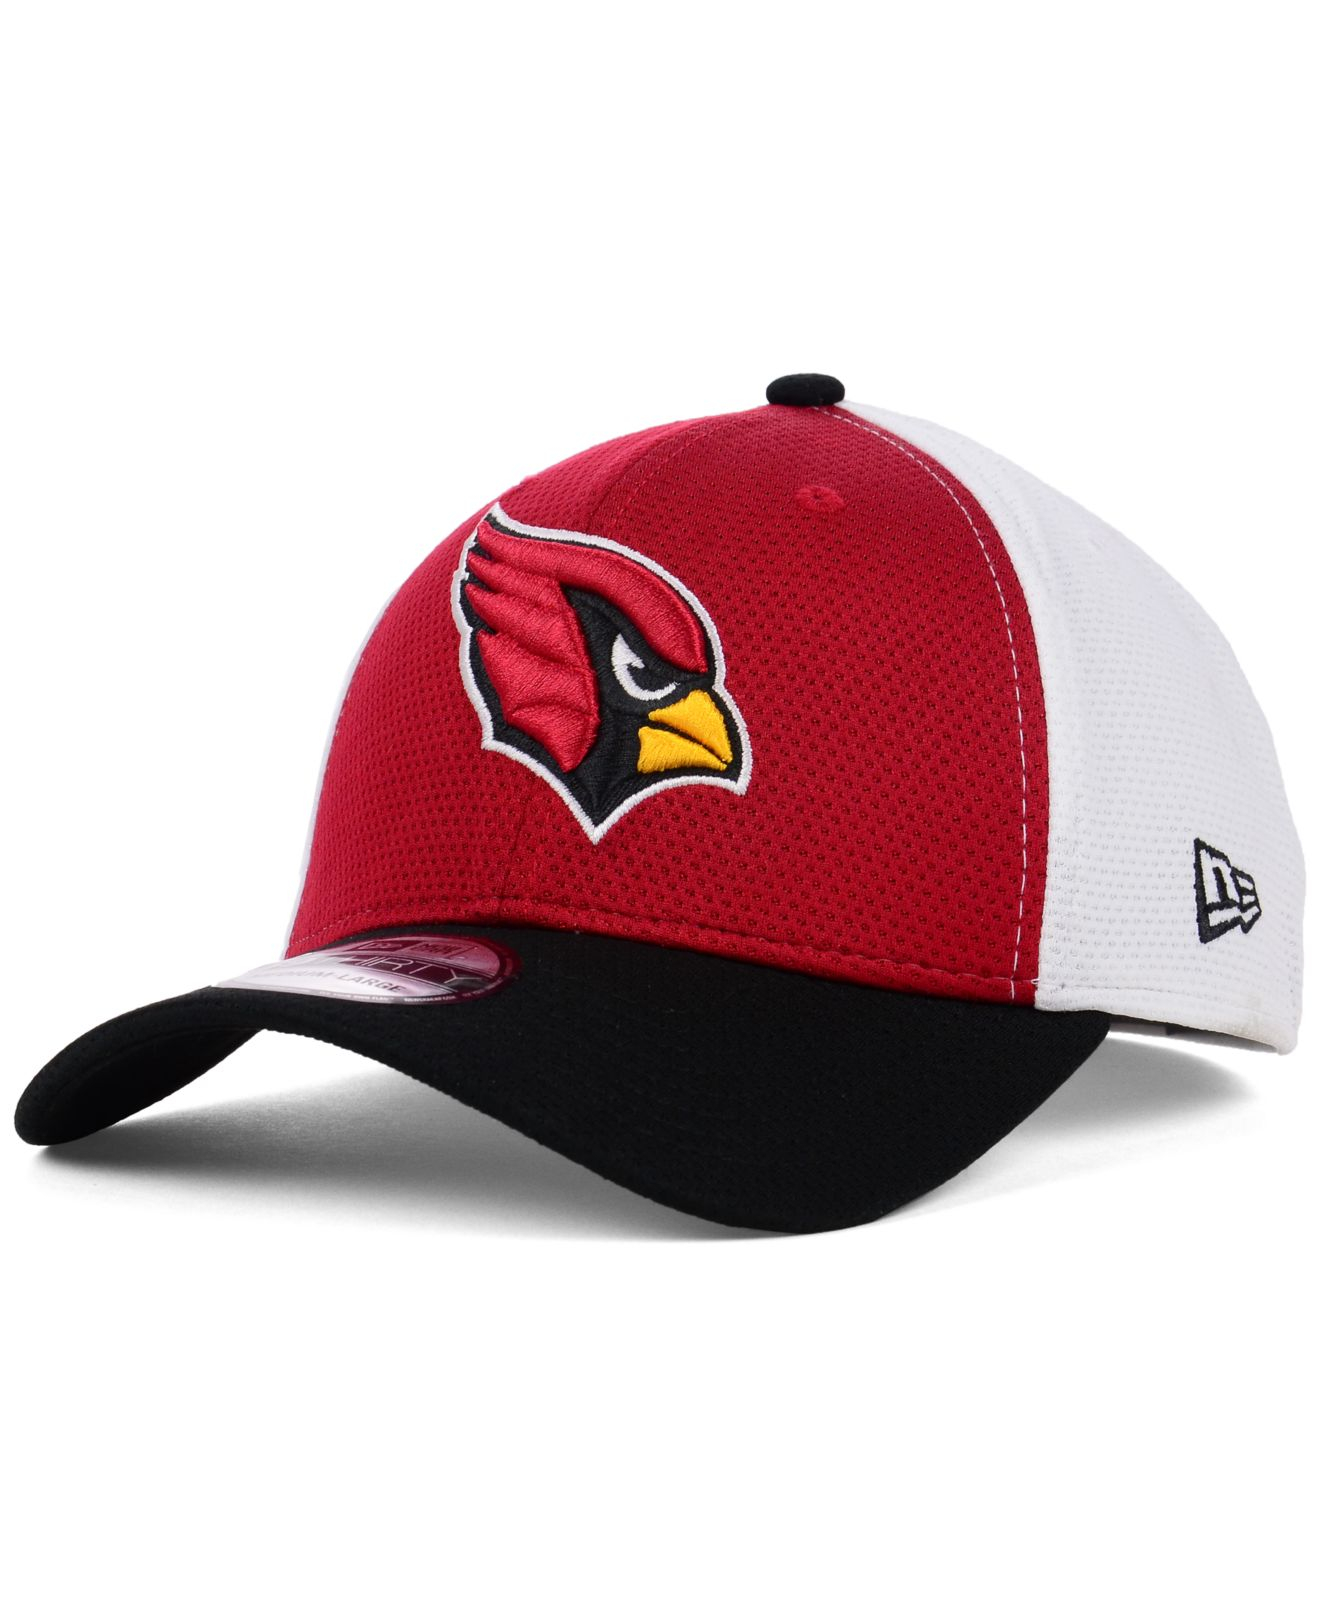 new era arizona cardinals logo stretch 39thirty cap in red. Black Bedroom Furniture Sets. Home Design Ideas